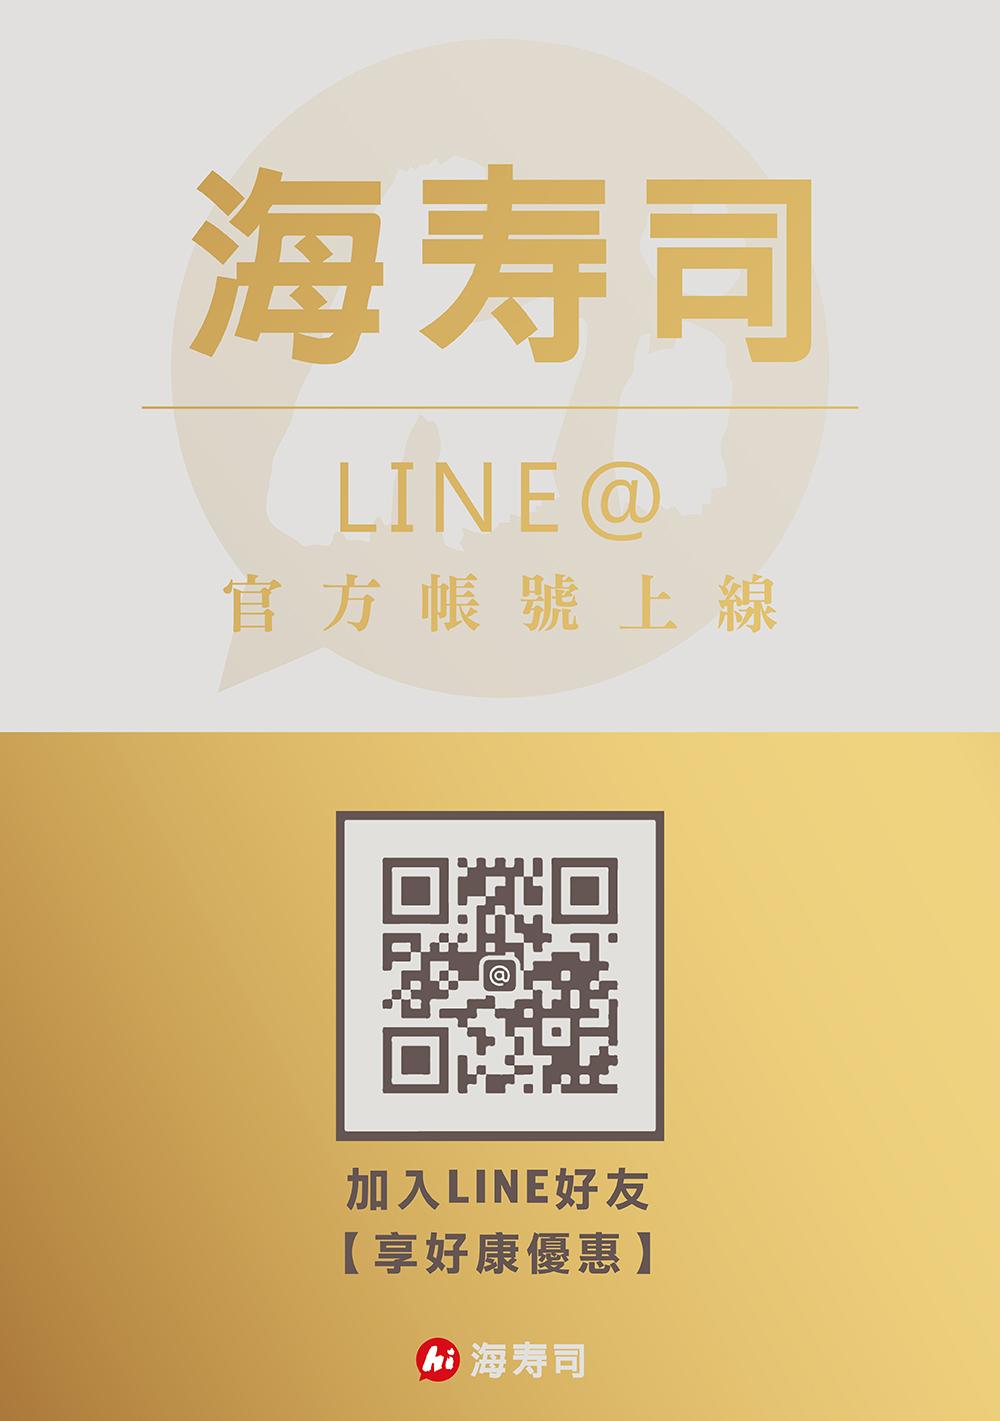 海壽司Line@上線了!快來加入Line好友